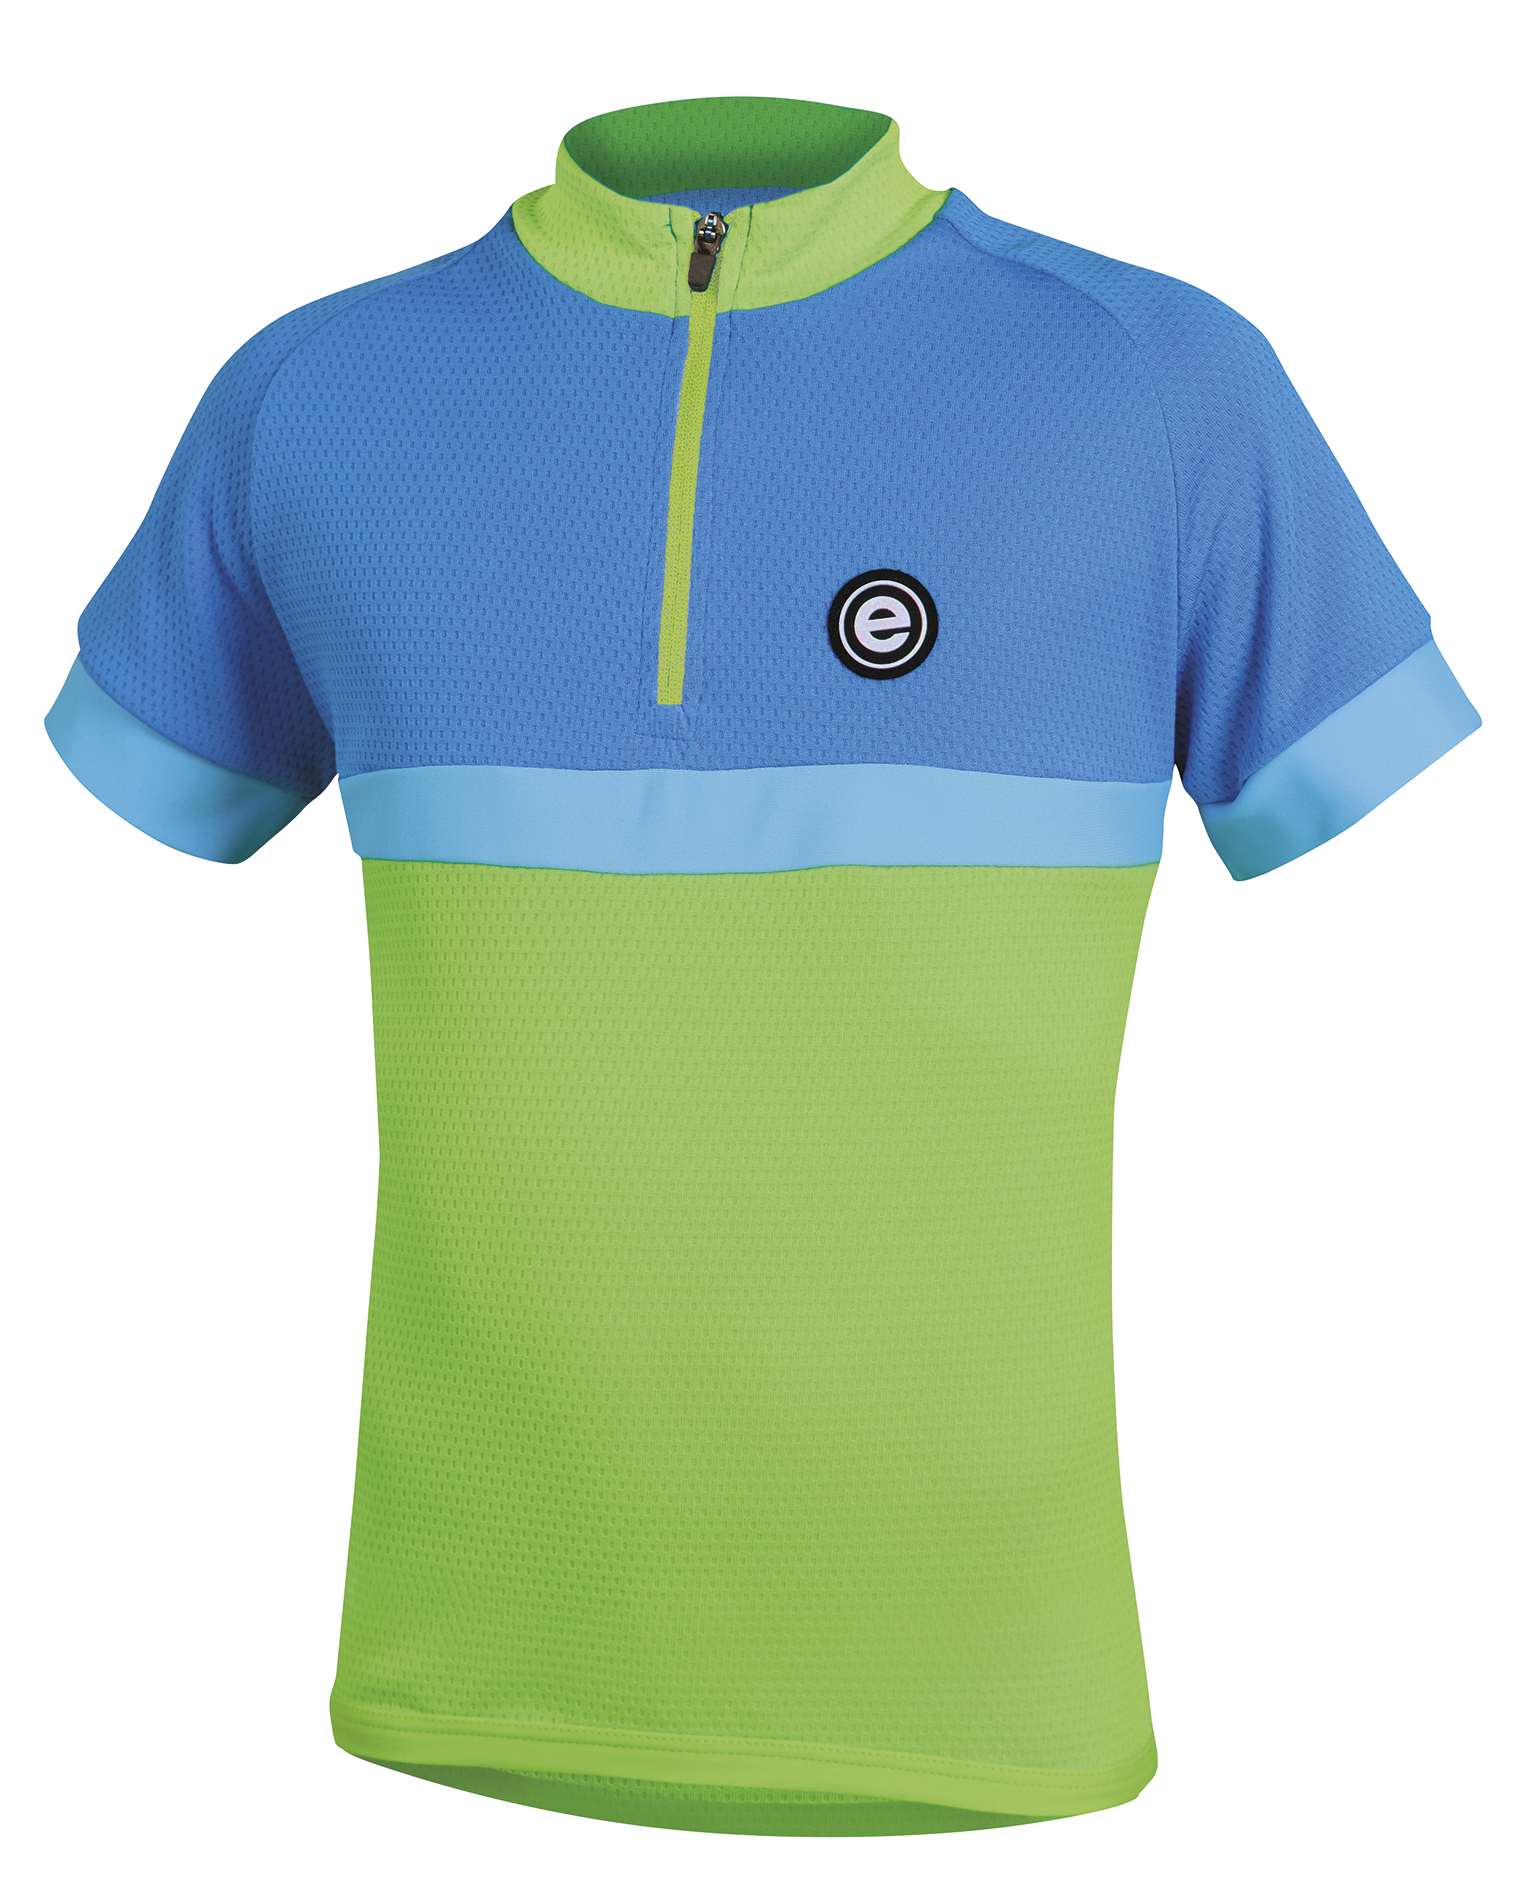 Dětský cyklistický dres ETAPE Bambino, 140/146, zelená/modrá, model 2017 (Dětský dres Etape, přední zip)